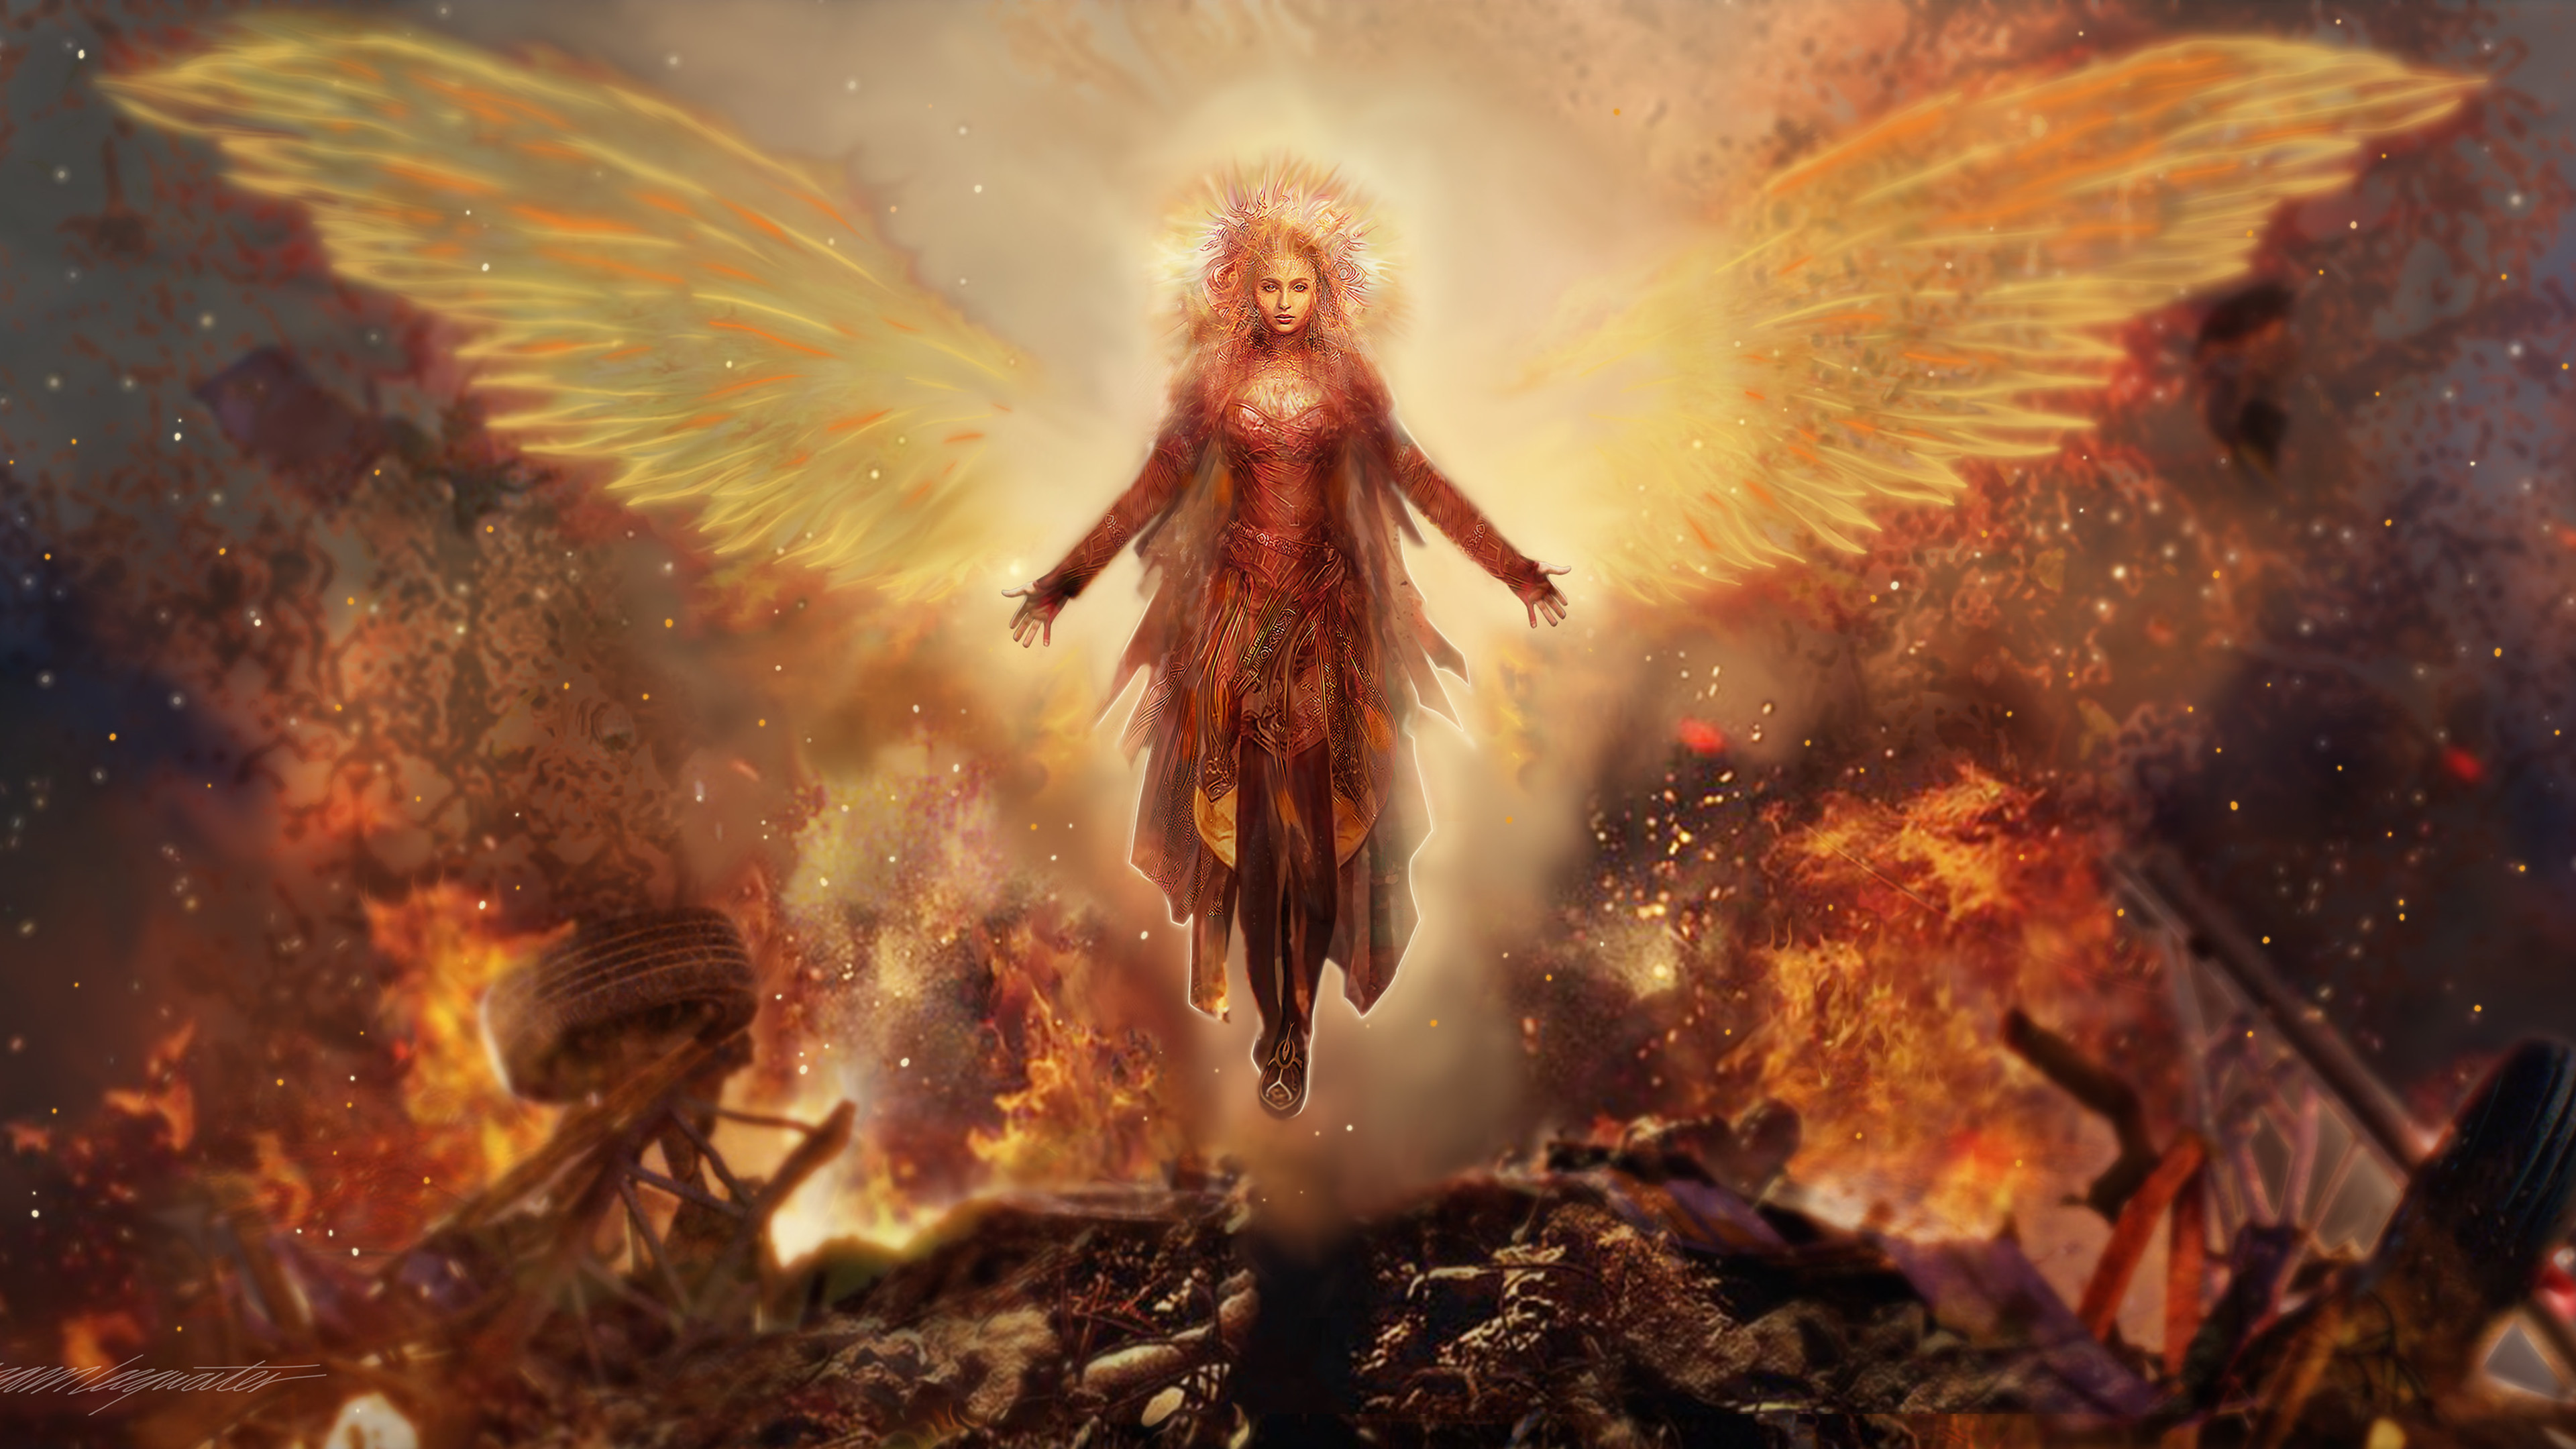 x men dark phoenix art 1563220403 - X Men Dark Phoenix Art - x men dark phoenix wallpapers, superheroes wallpapers, hd-wallpapers, digital art wallpapers, dark phoenix wallpapers, cosplay wallpapers, behance wallpapers, artwork wallpapers, 4k-wallpapers